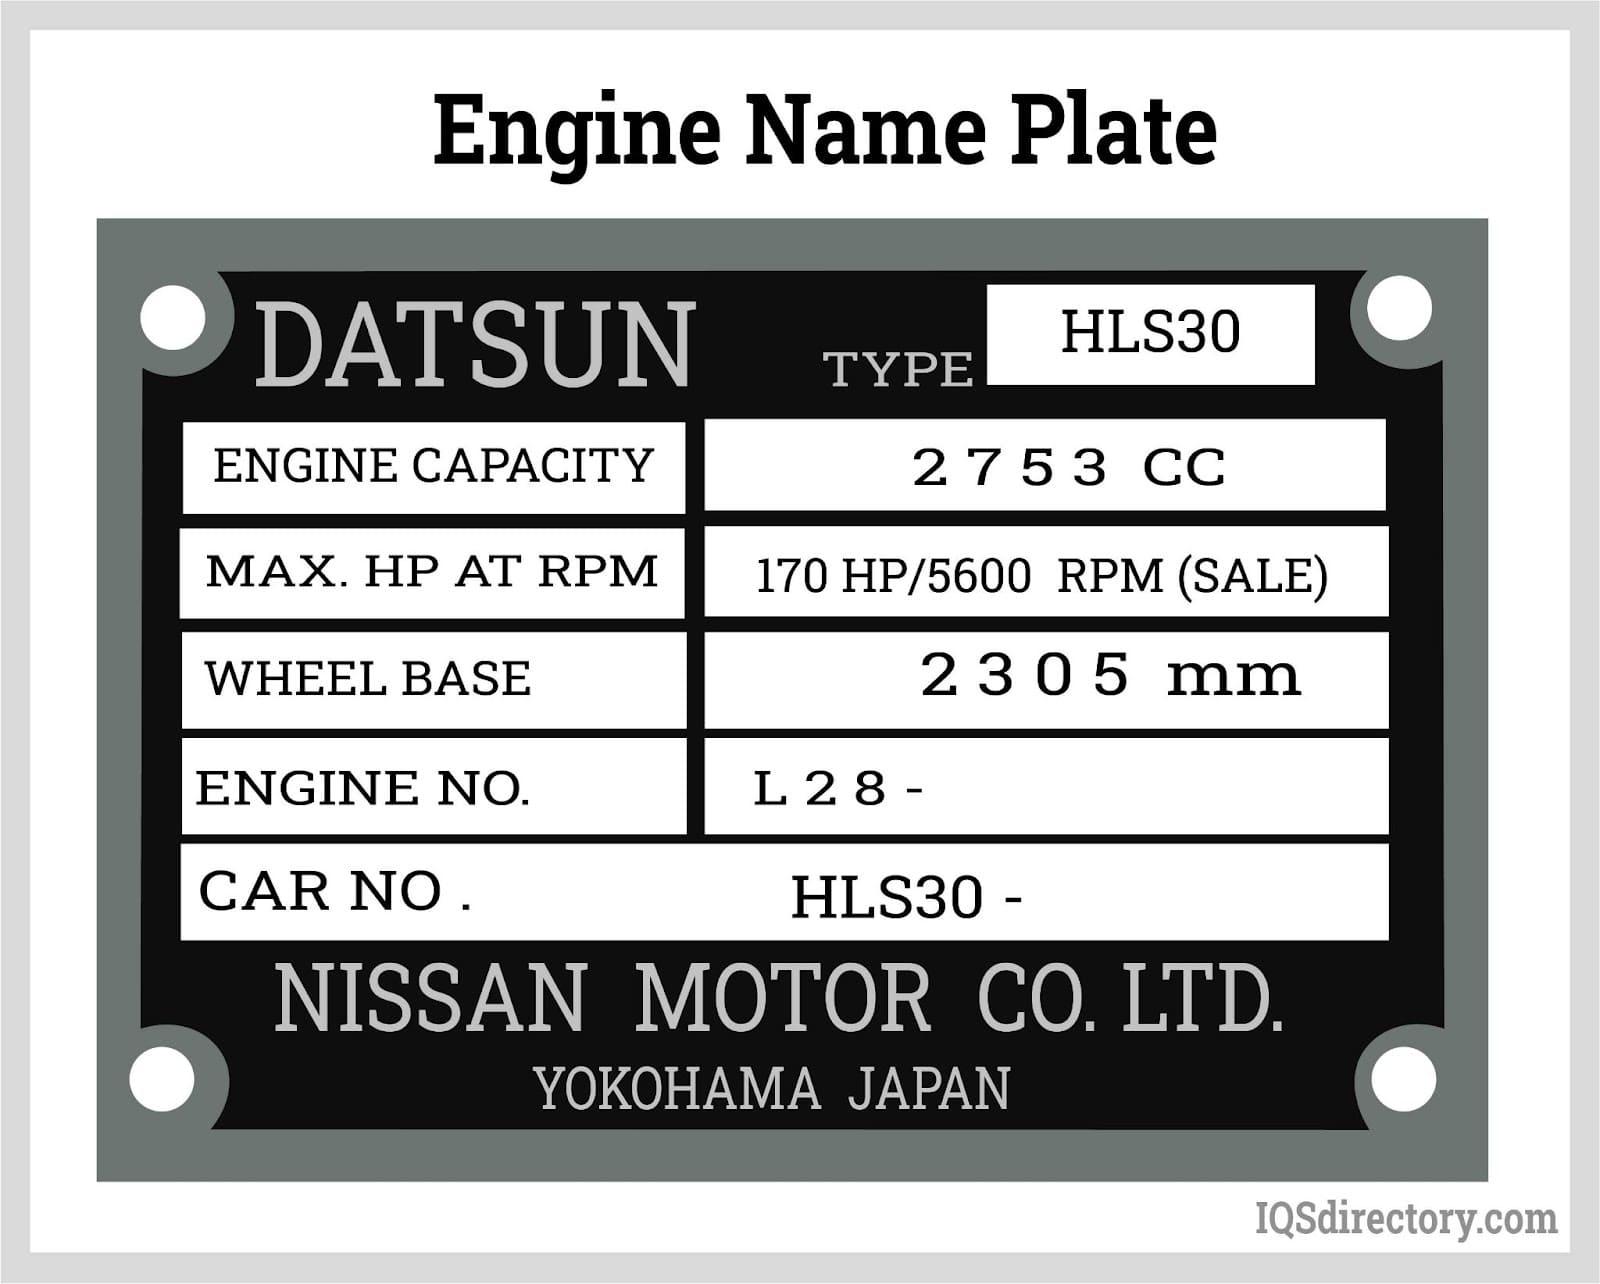 Engine Name Plate